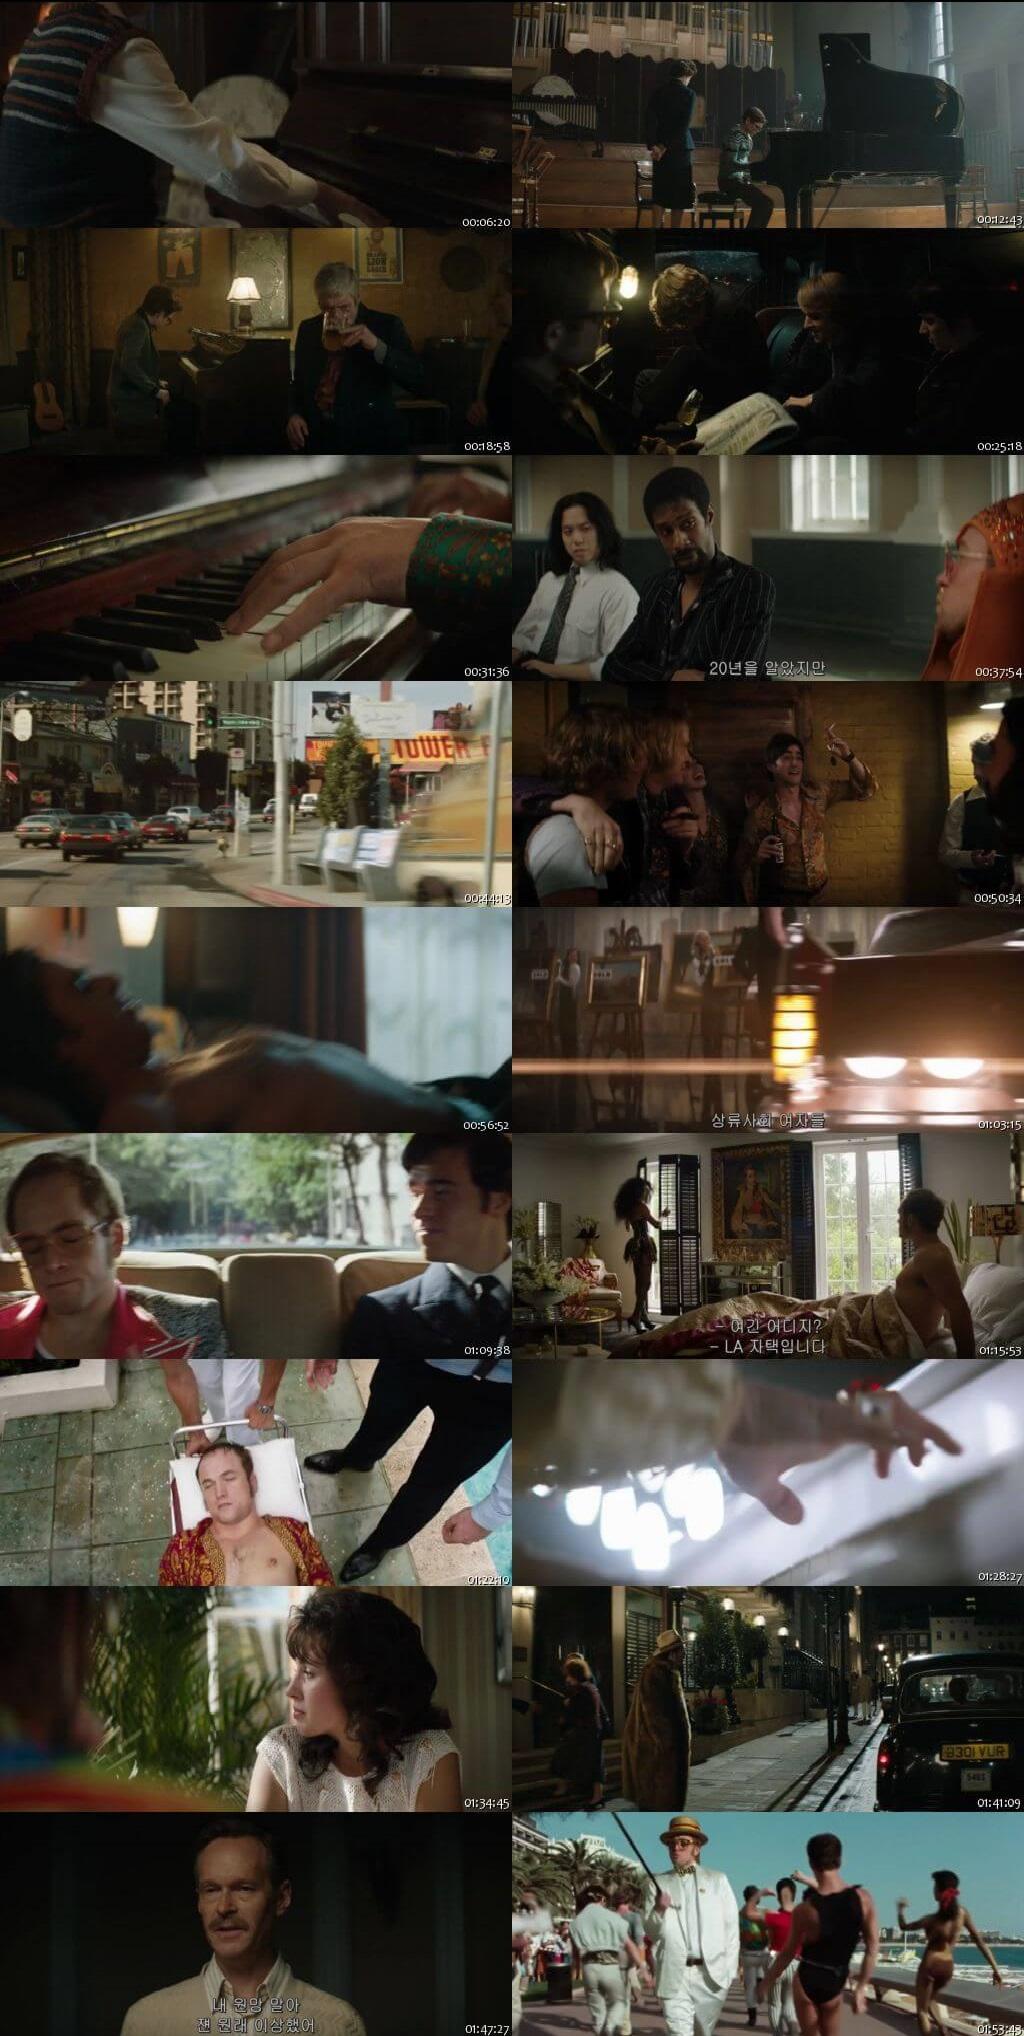 ScreenShotBreakthrough 2019 Movie Free Download 720p BluRay - MoviesCounter